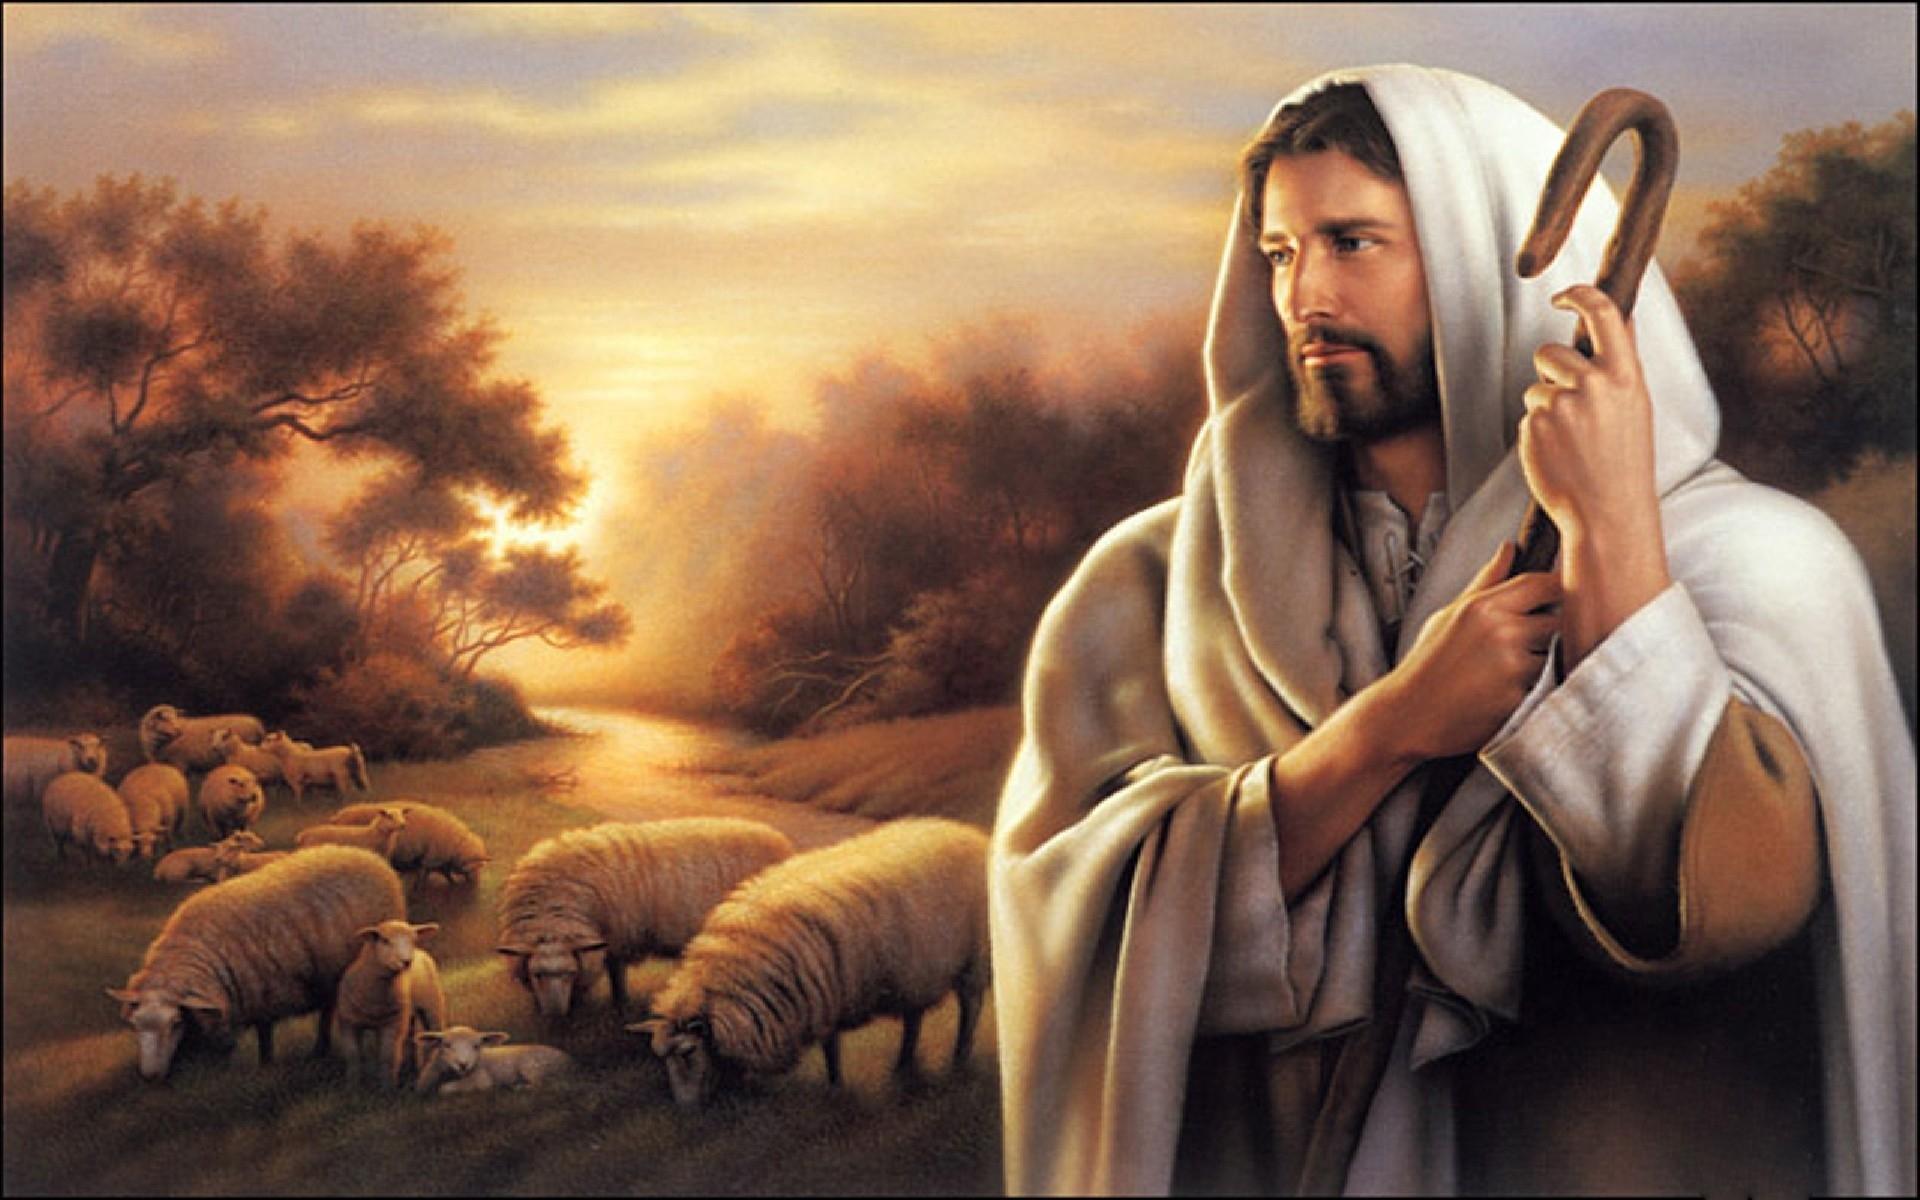 jesus shepherd hd wallpaper wallpapers - new hd wallpapers